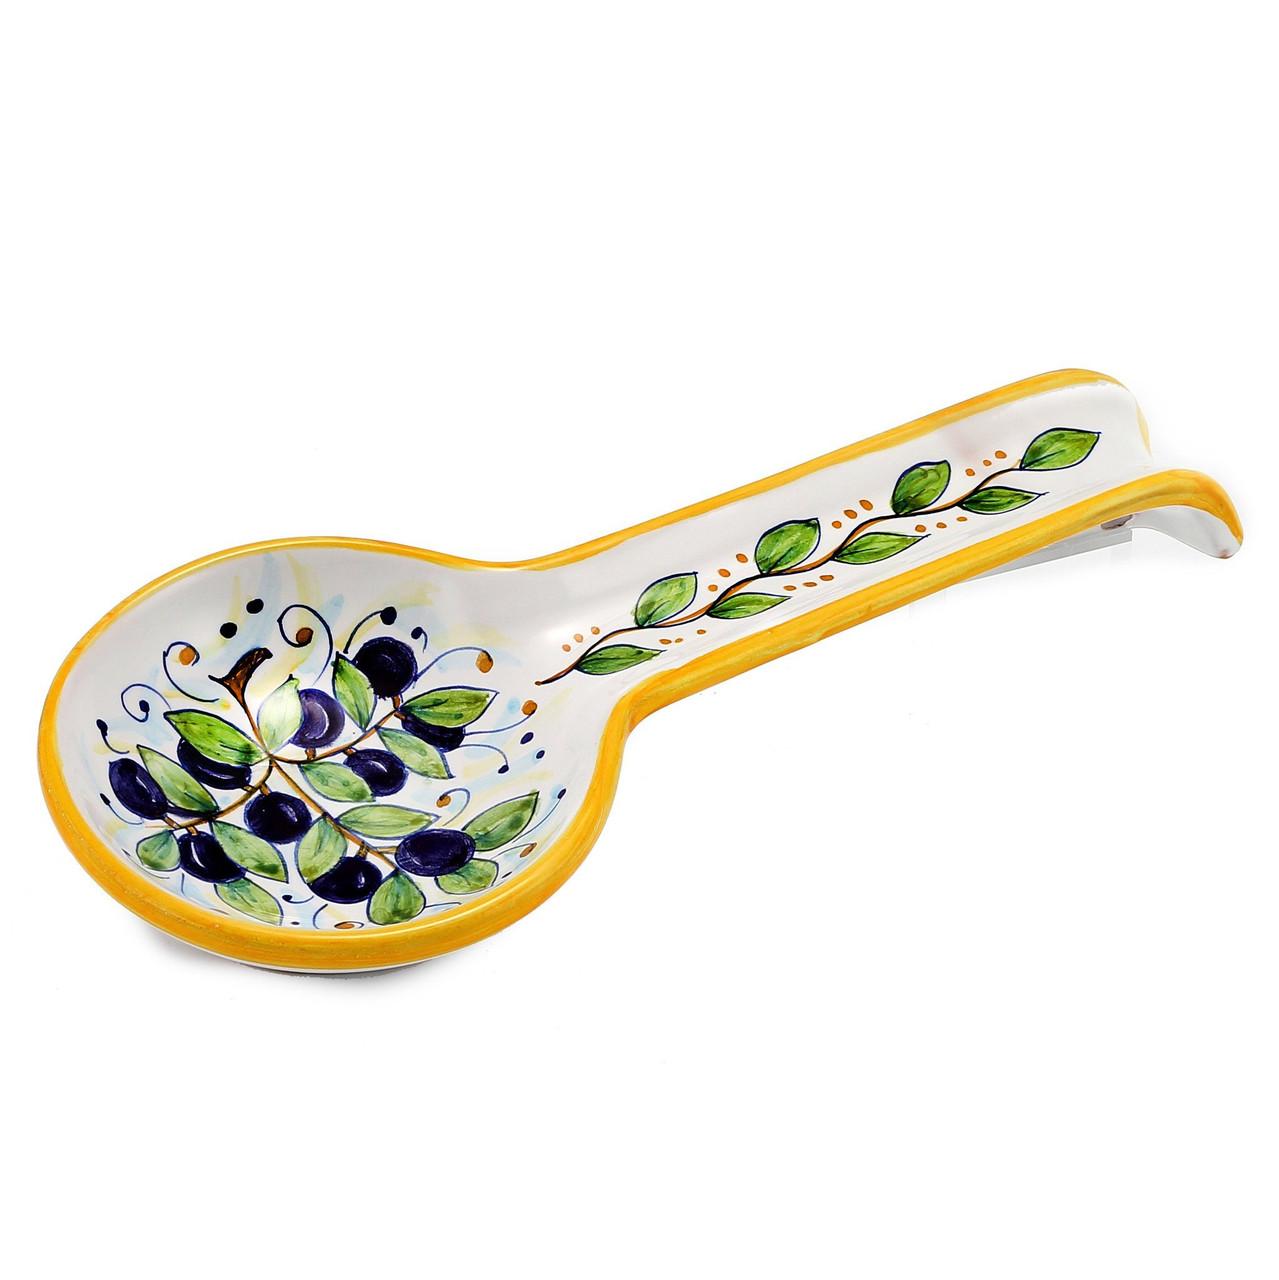 Italian Pottery Spoon Rest Olives